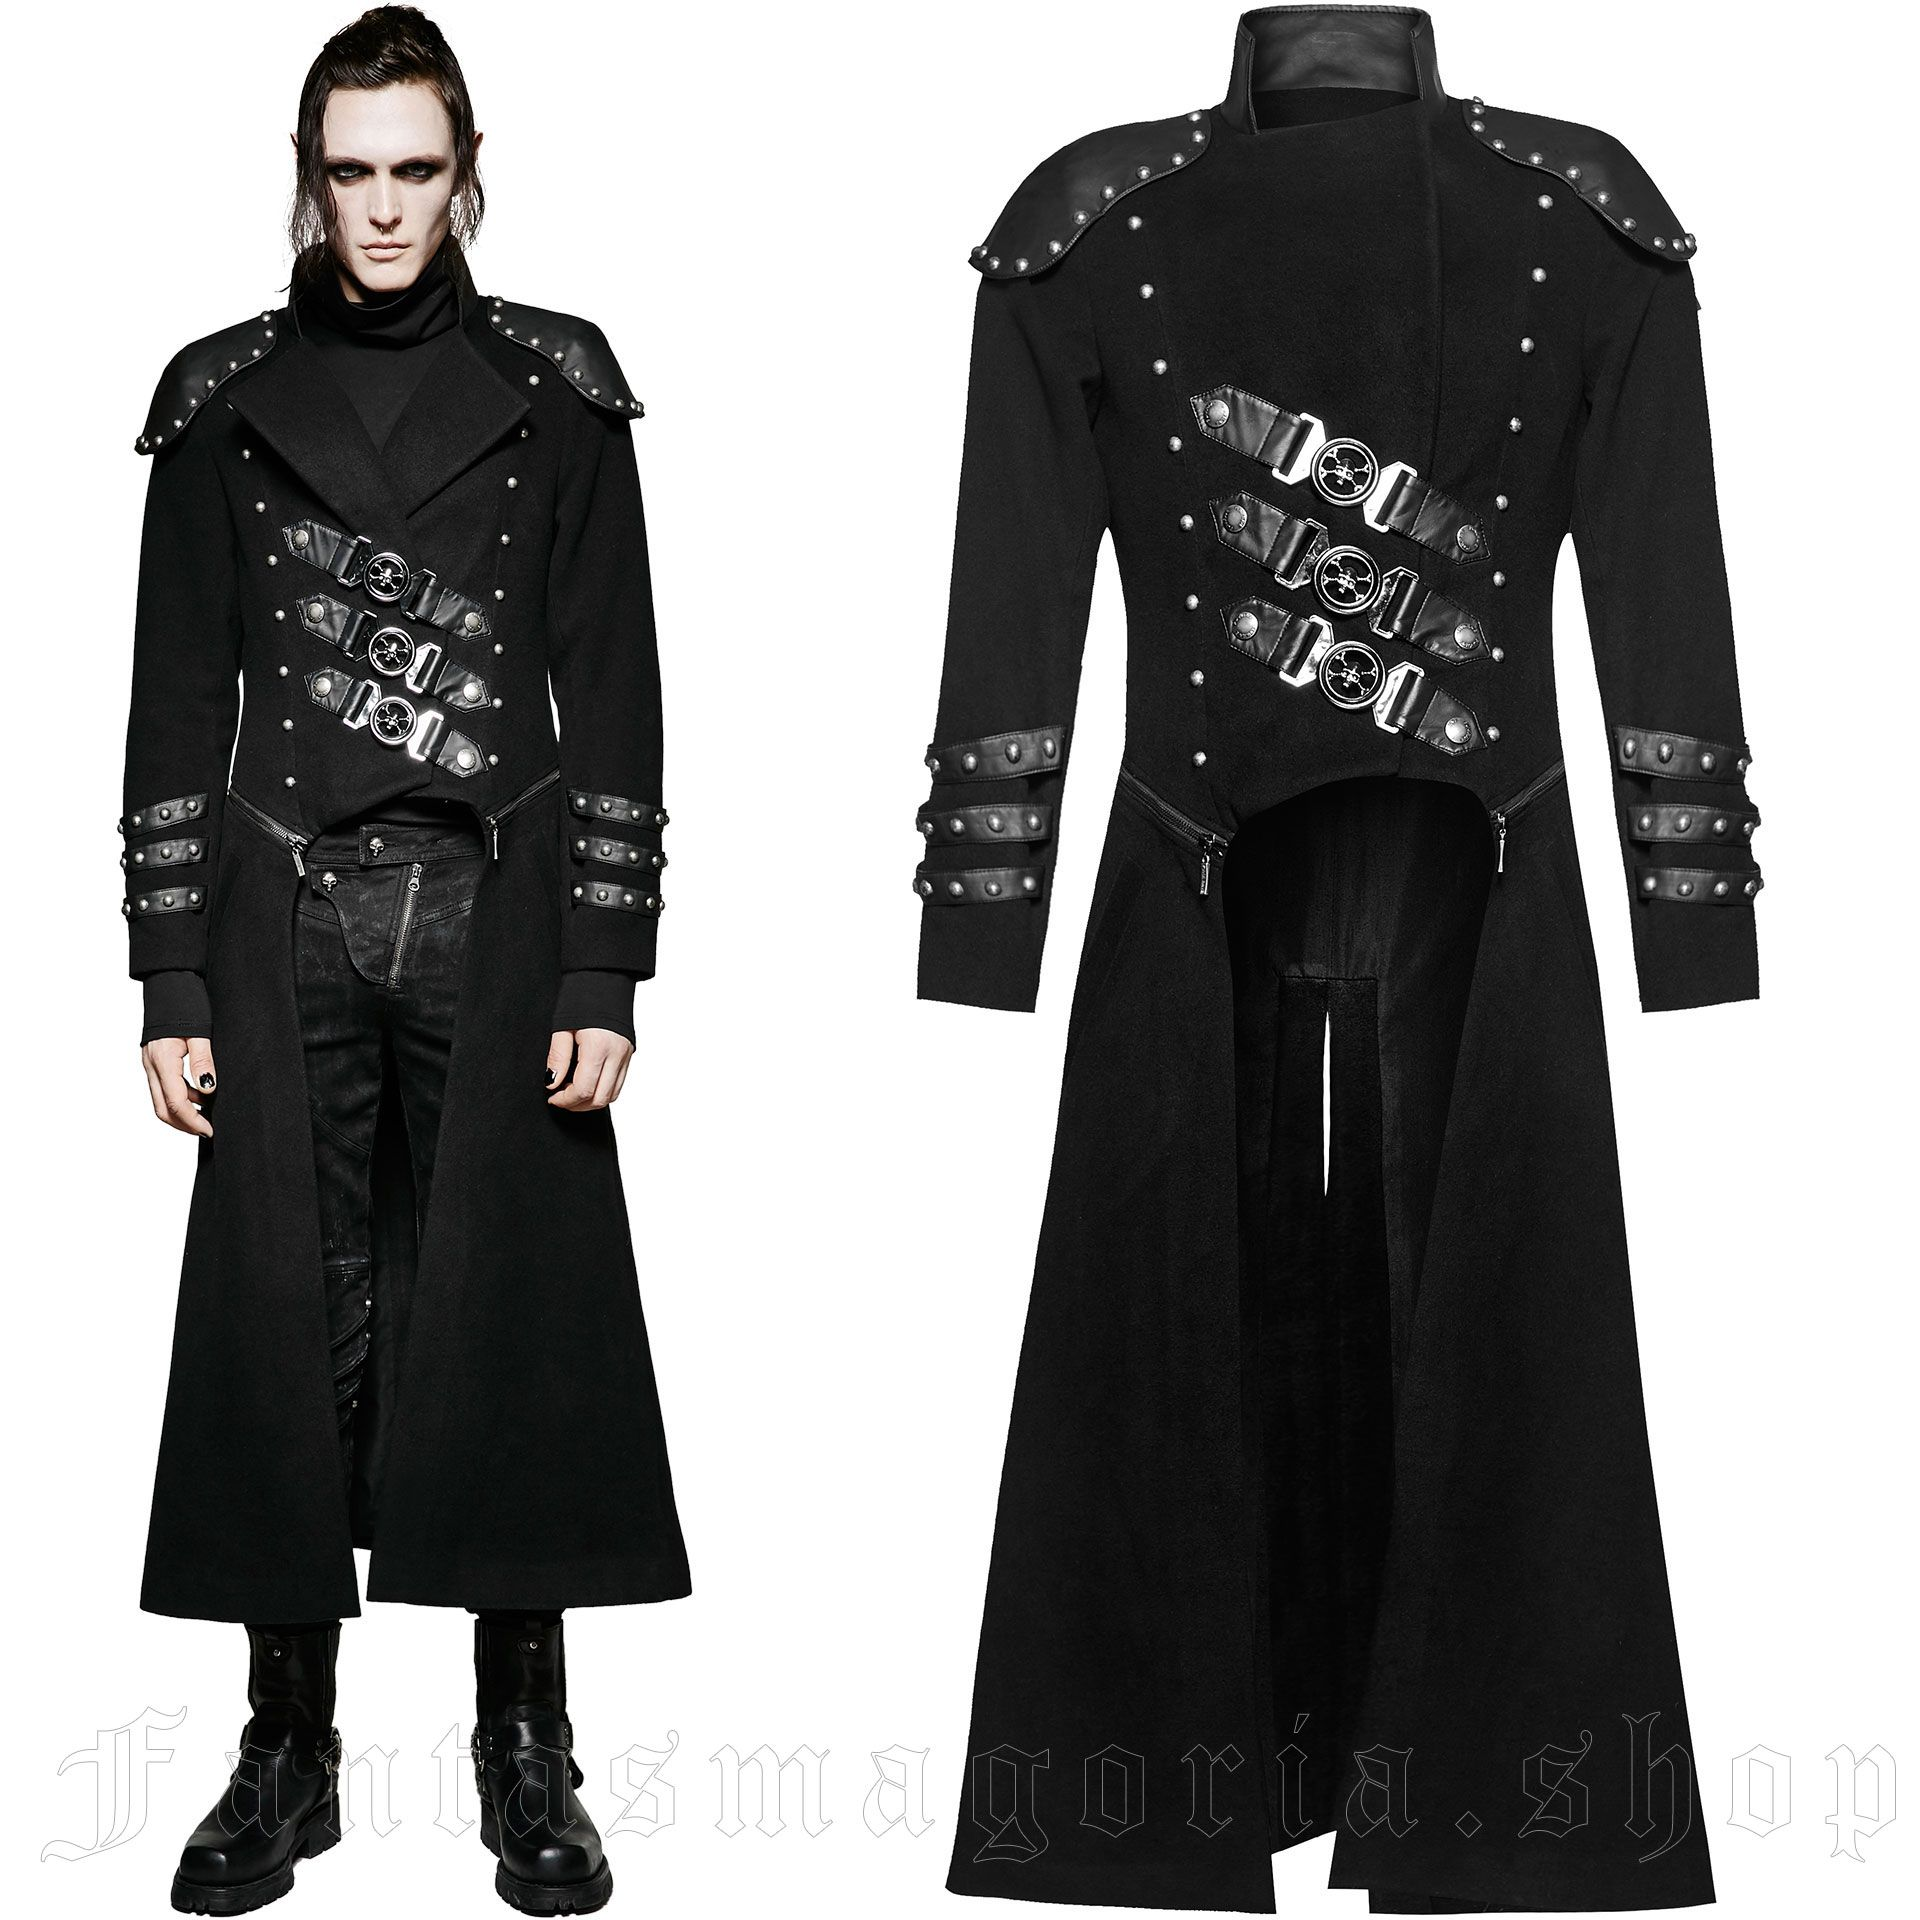 men's Daemon Coat by PUNK RAVE brand, code: Y-708